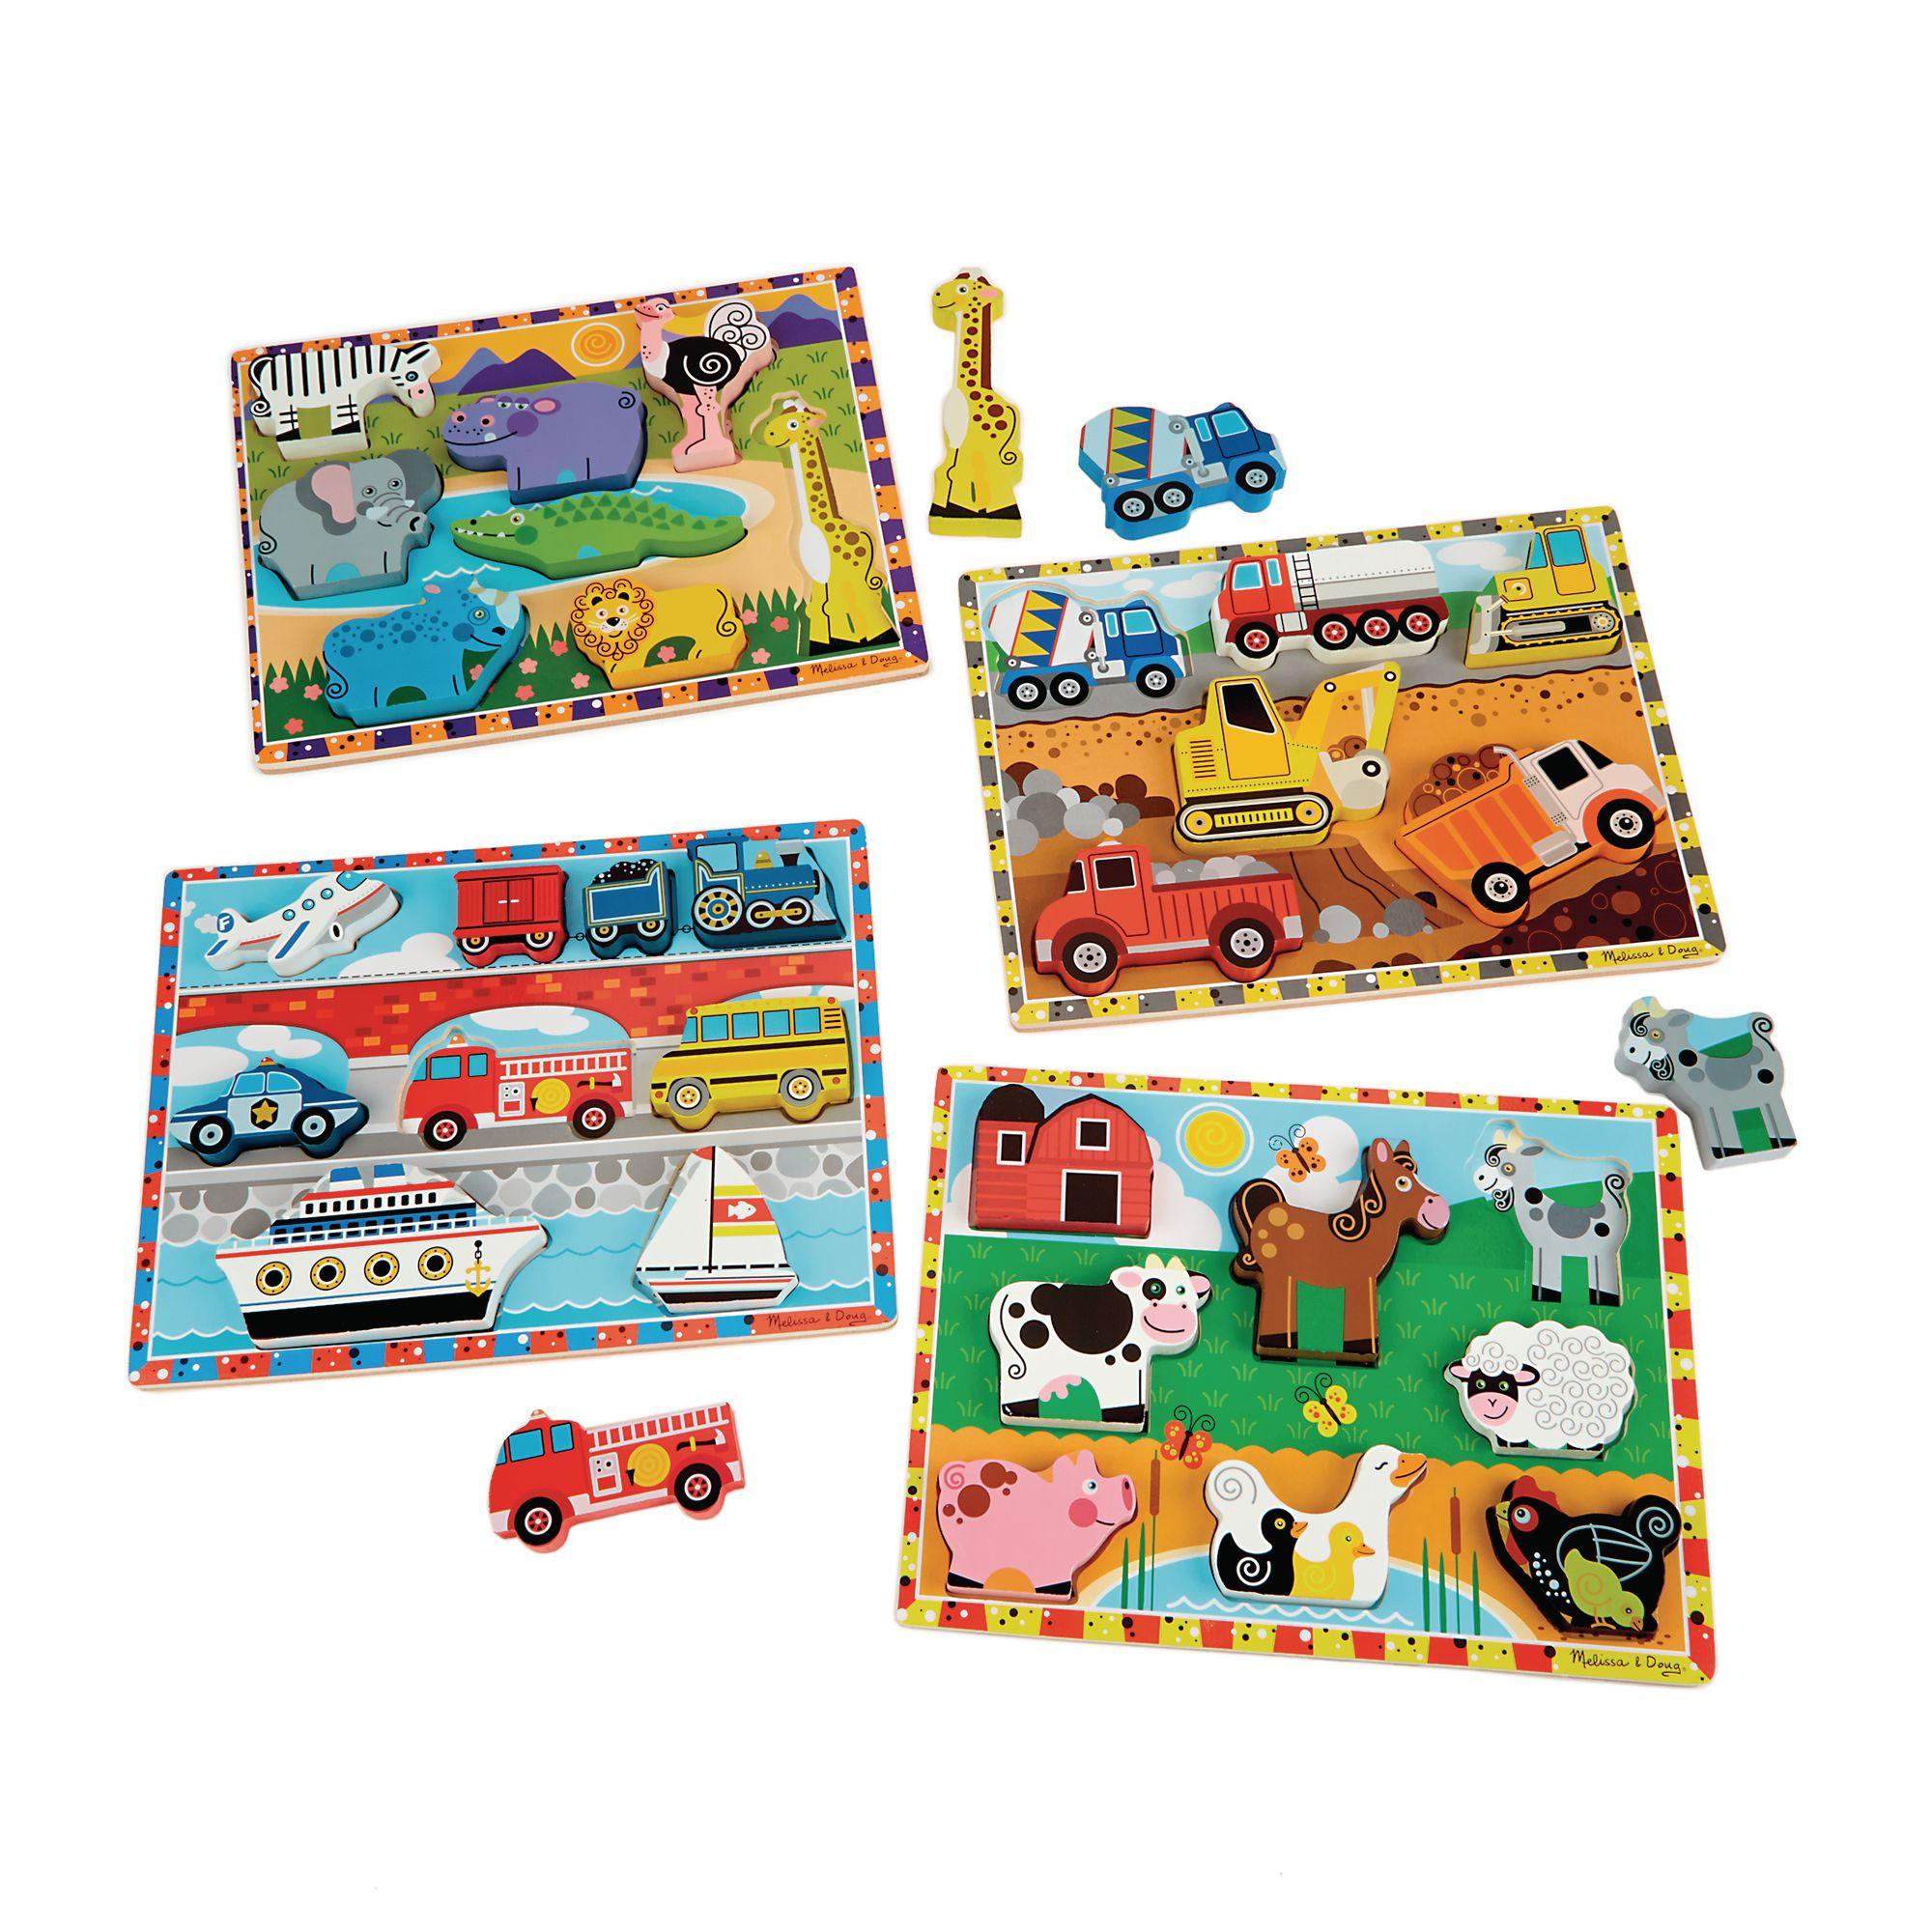 Chunky Puzzles Hope Education